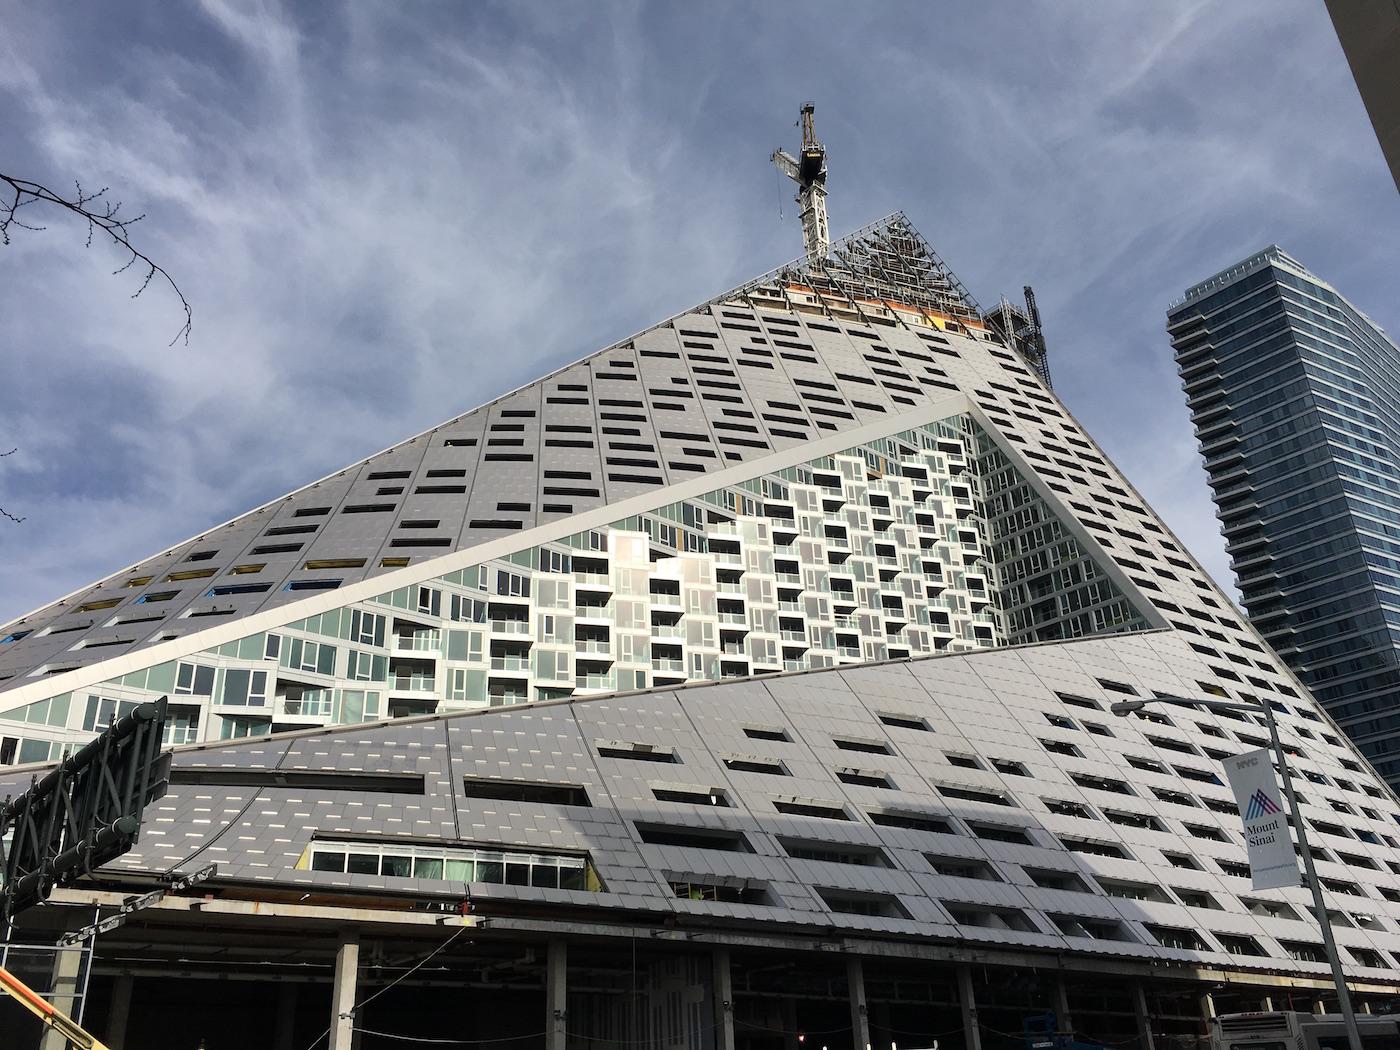 New Photos Highlight New York's VIA 57 West | SkyriseCities